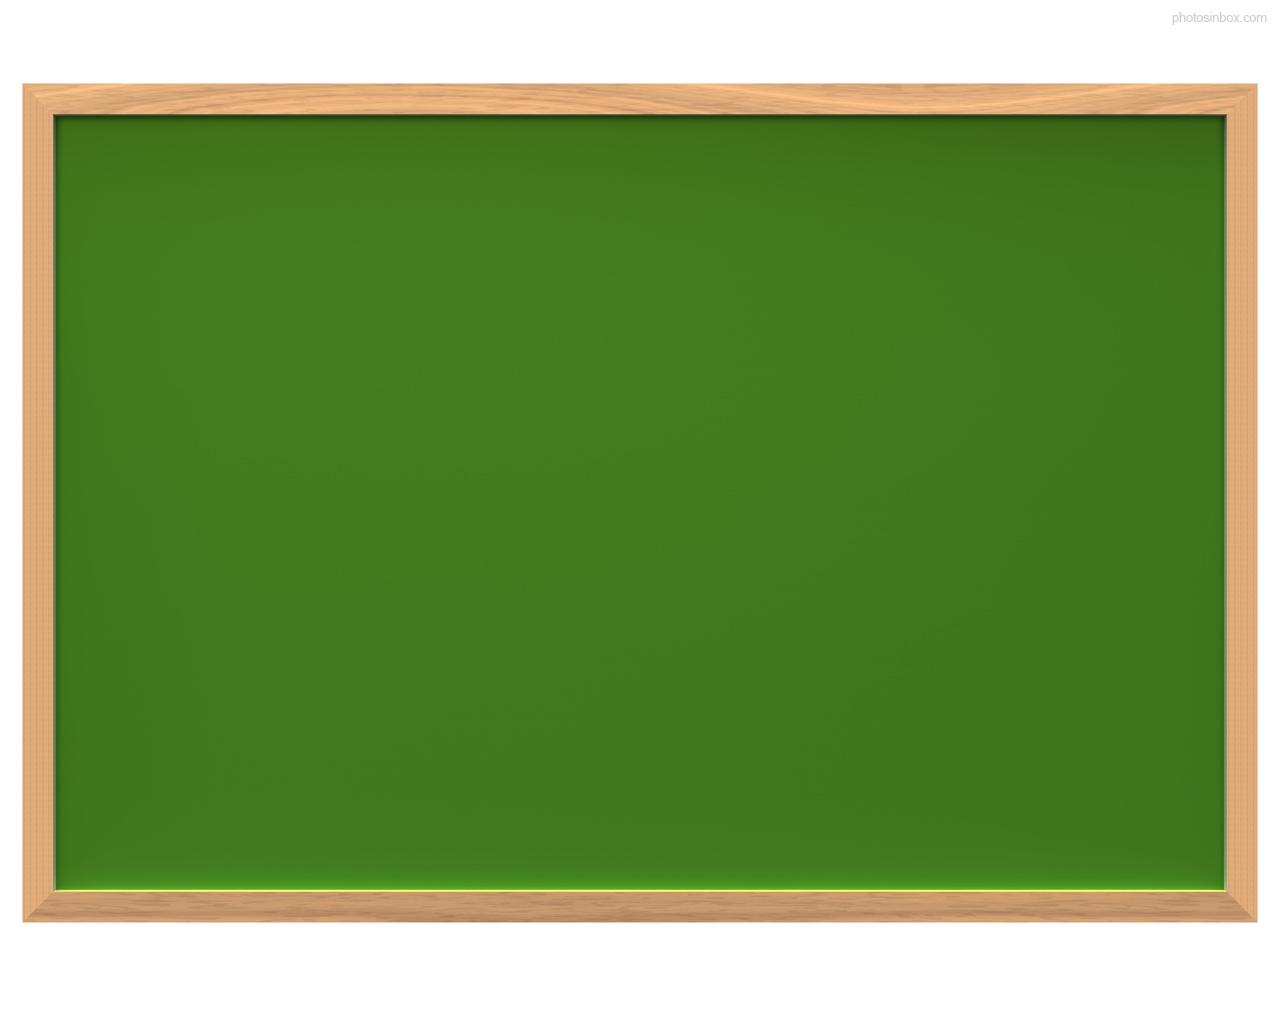 Background Chalkboard Clipart.